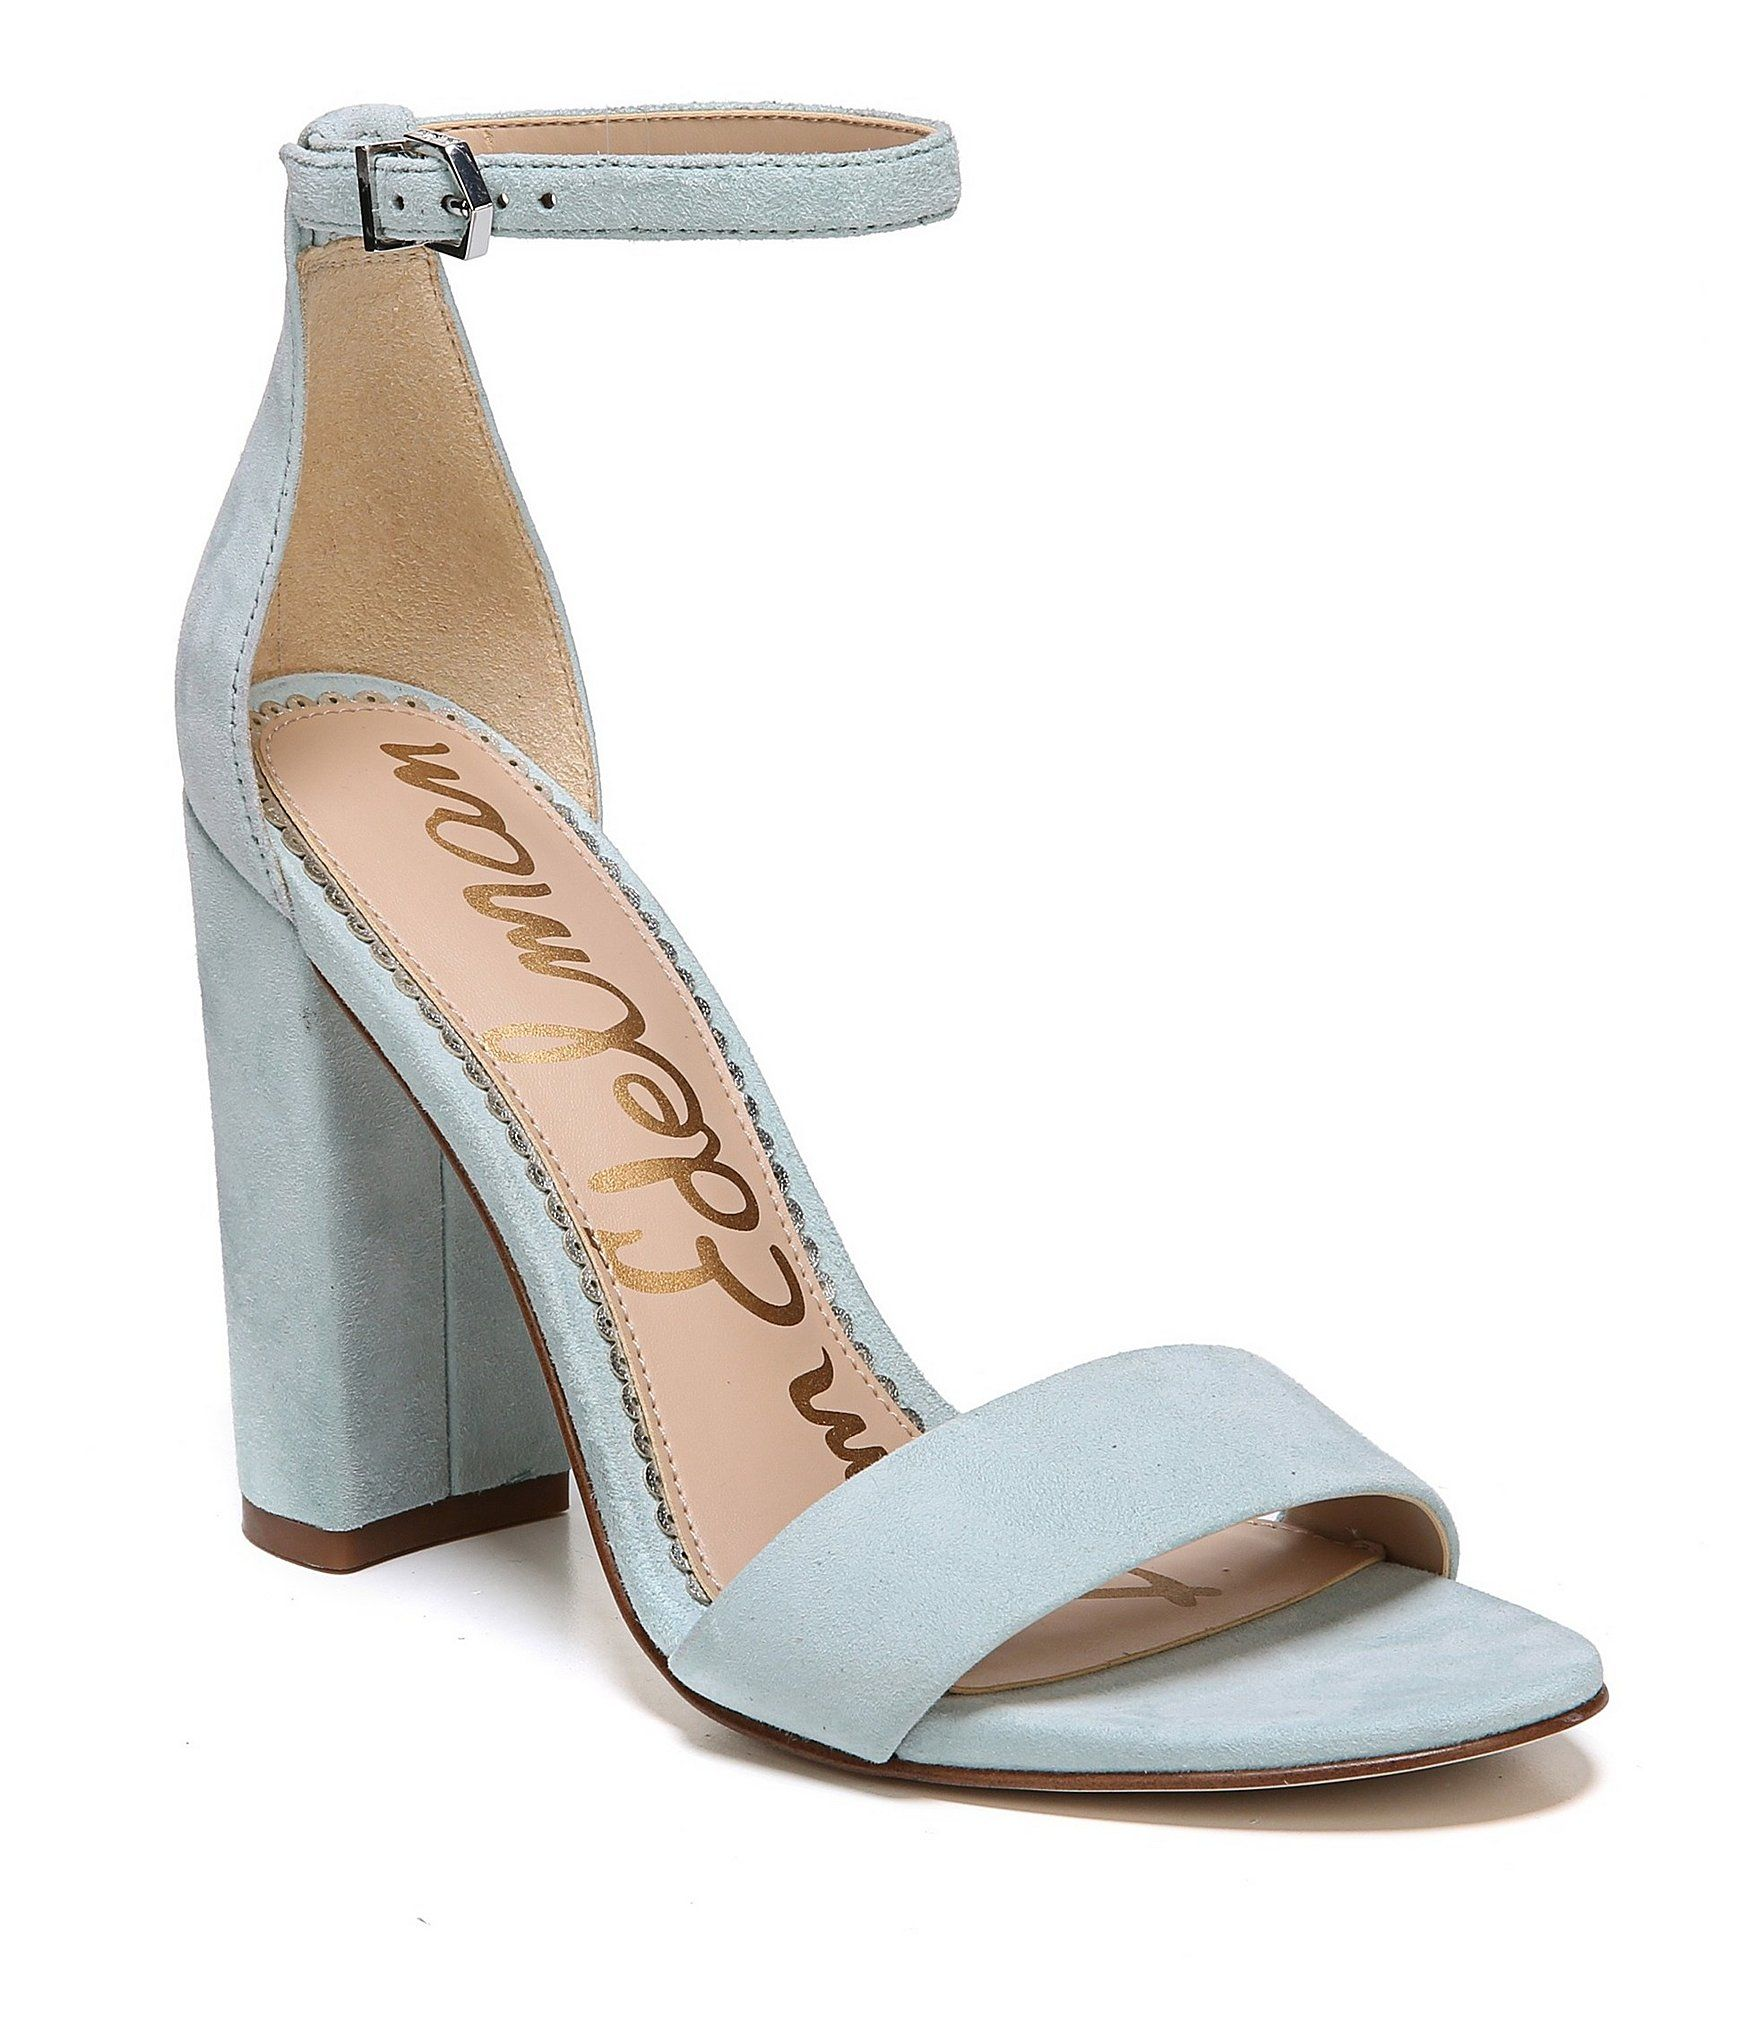 Yaro Suede Ankle Strap Block Heel Dress Sandals lmJju